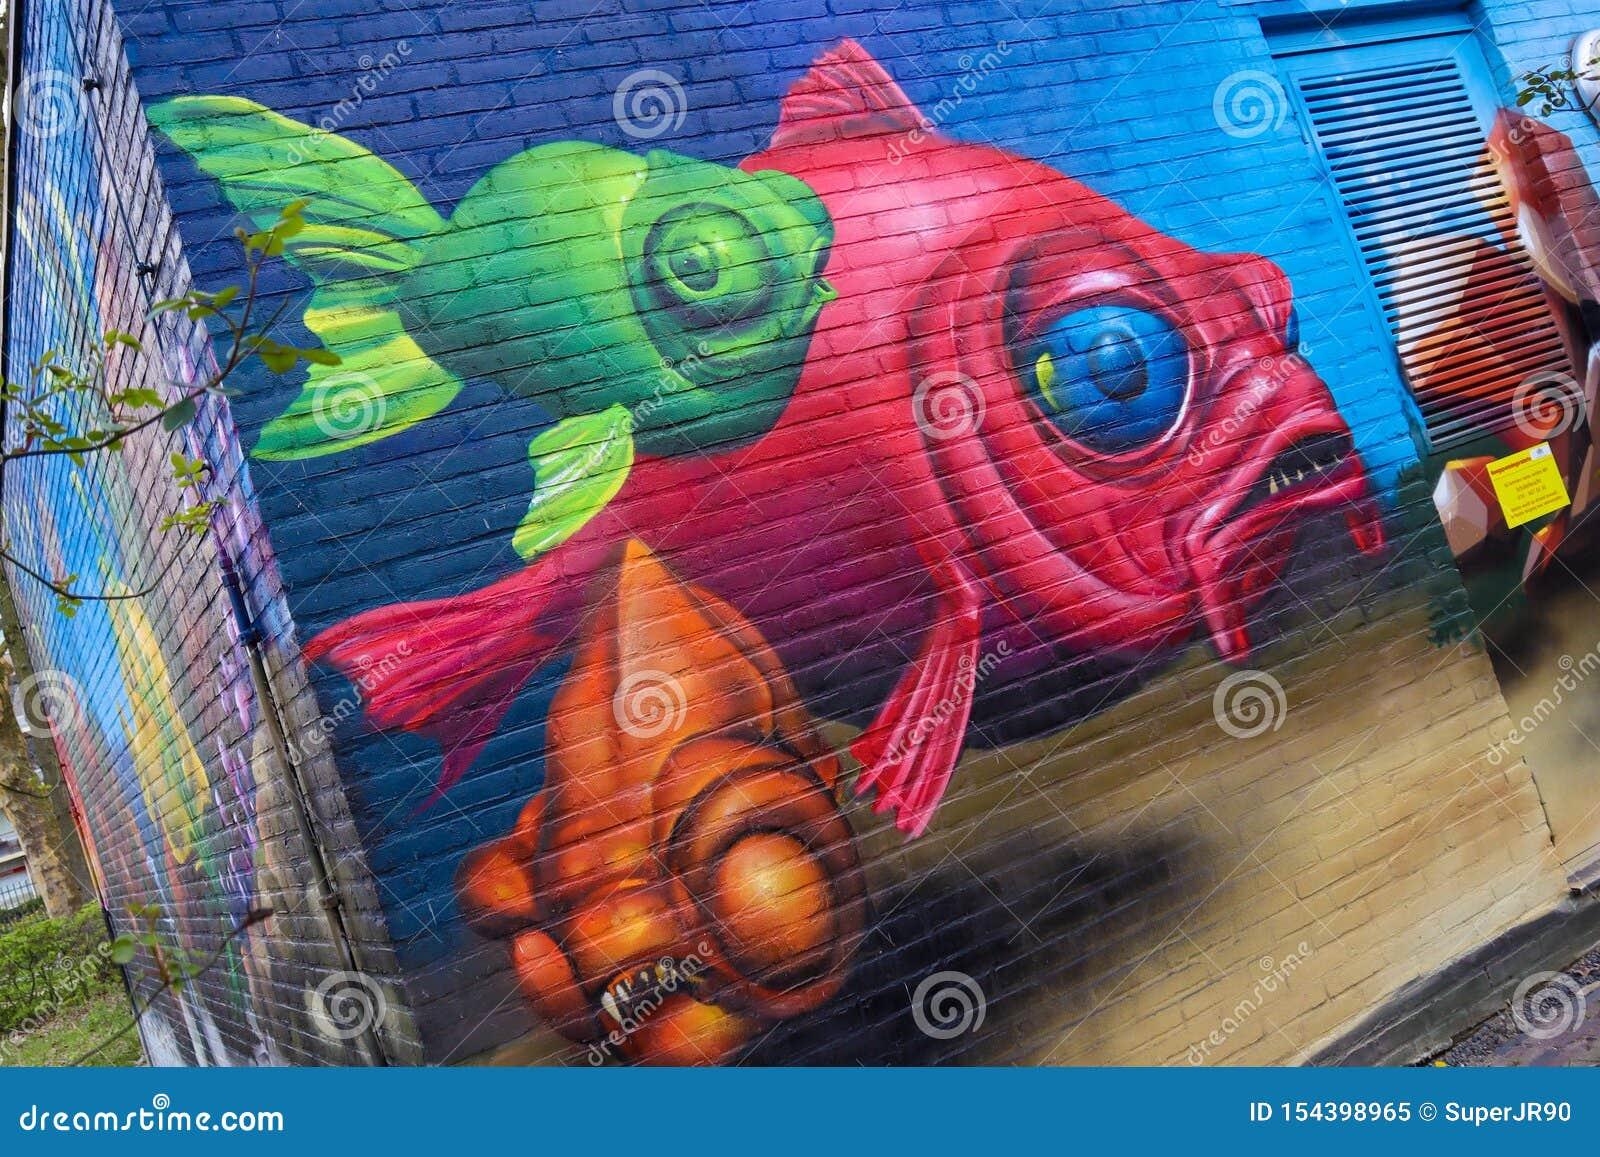 Peinture De Graffiti D Art De Mur De Poissons Avec De Belles